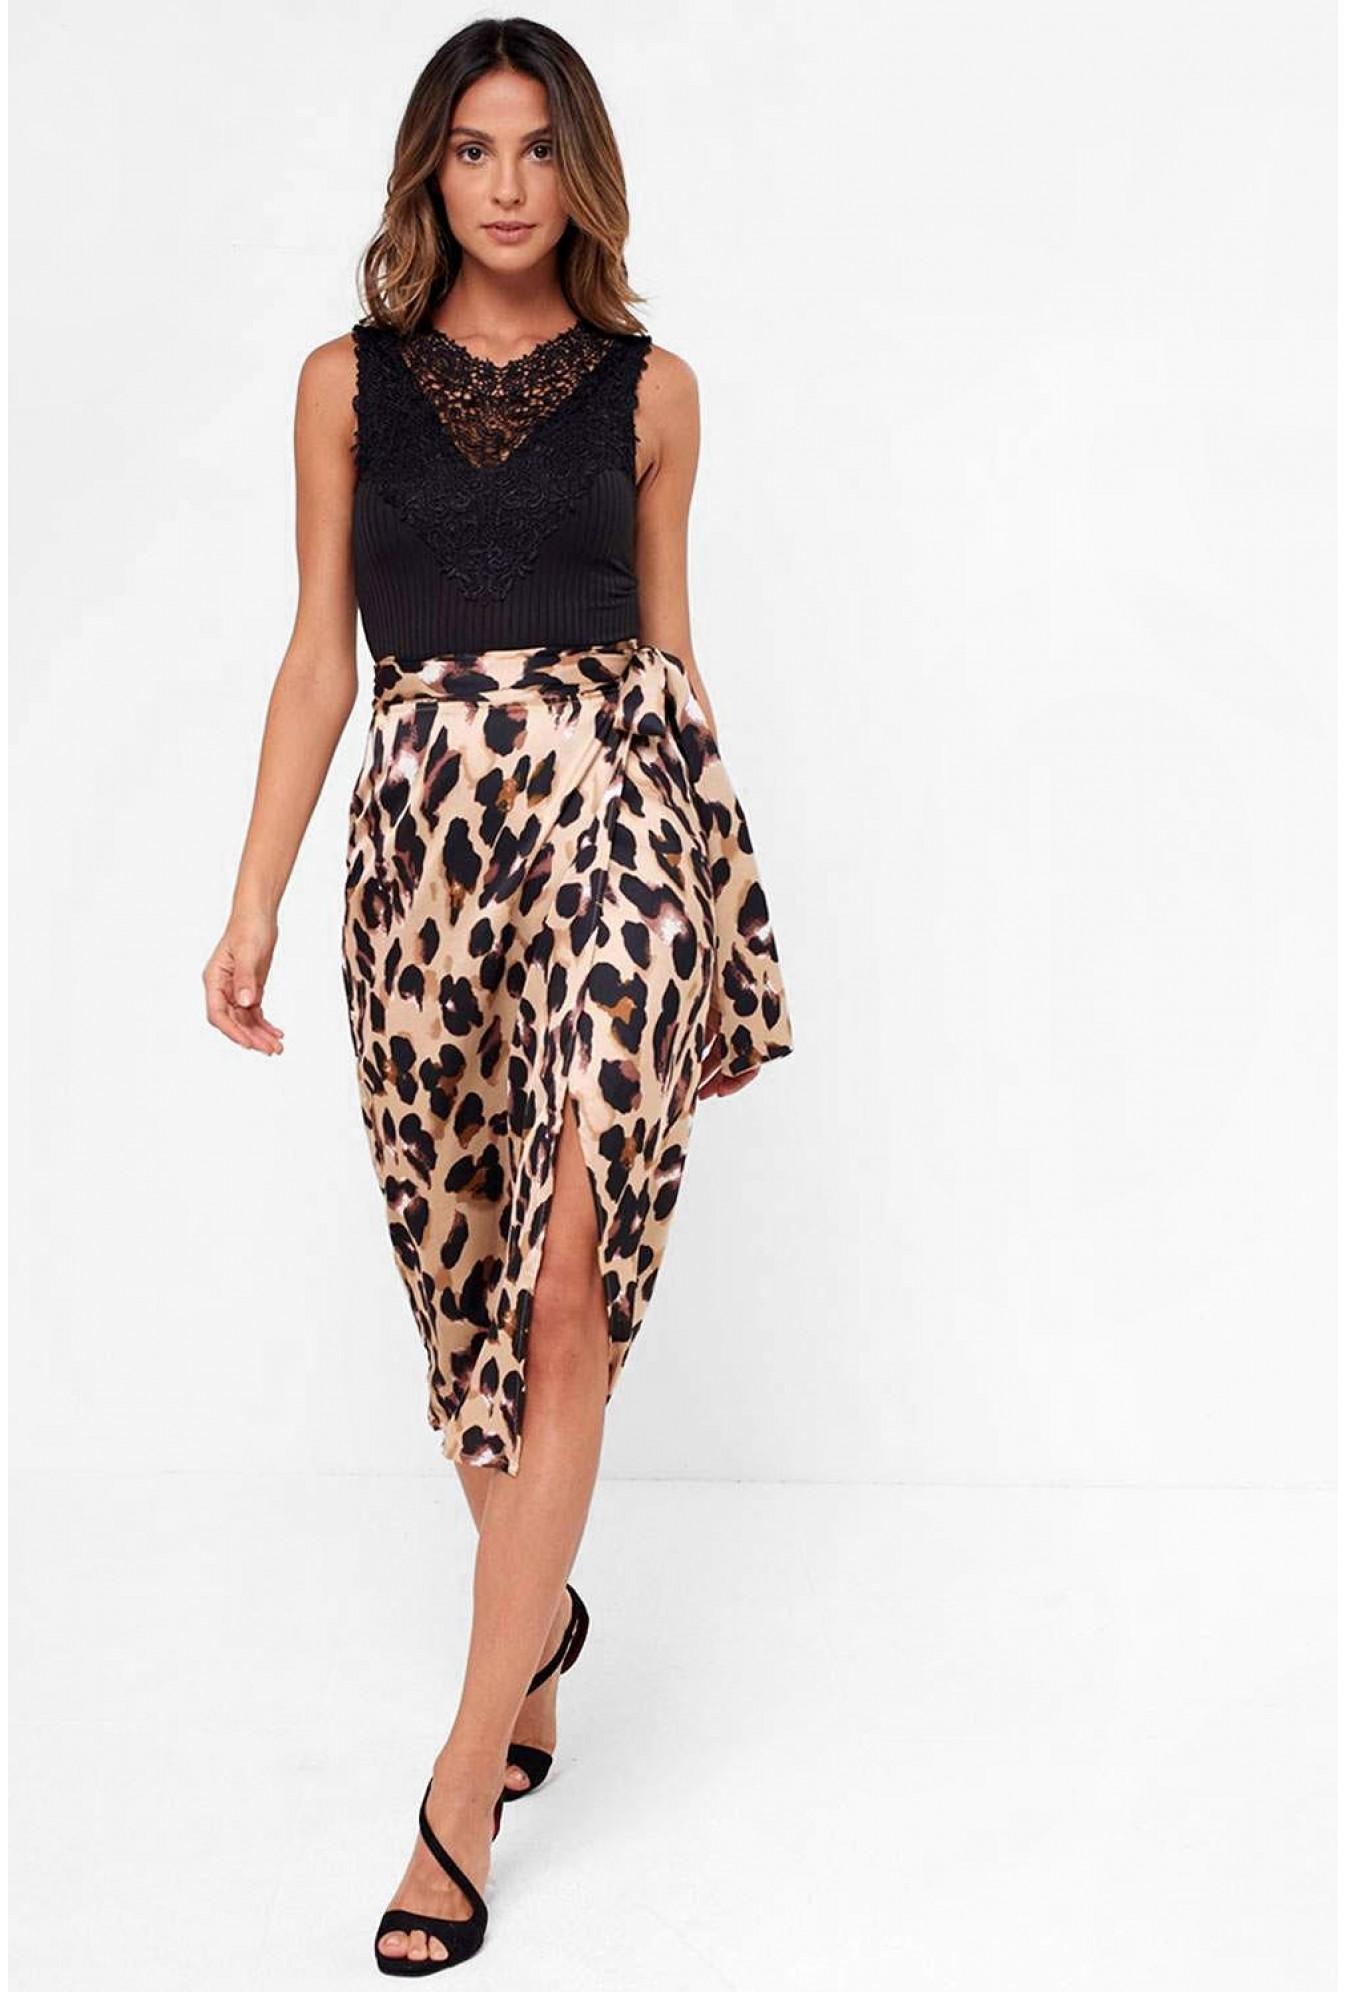 f3e0260b288 John Zack Jaxon Leopard Print Wrap Midi Skirt | iCLOTHING